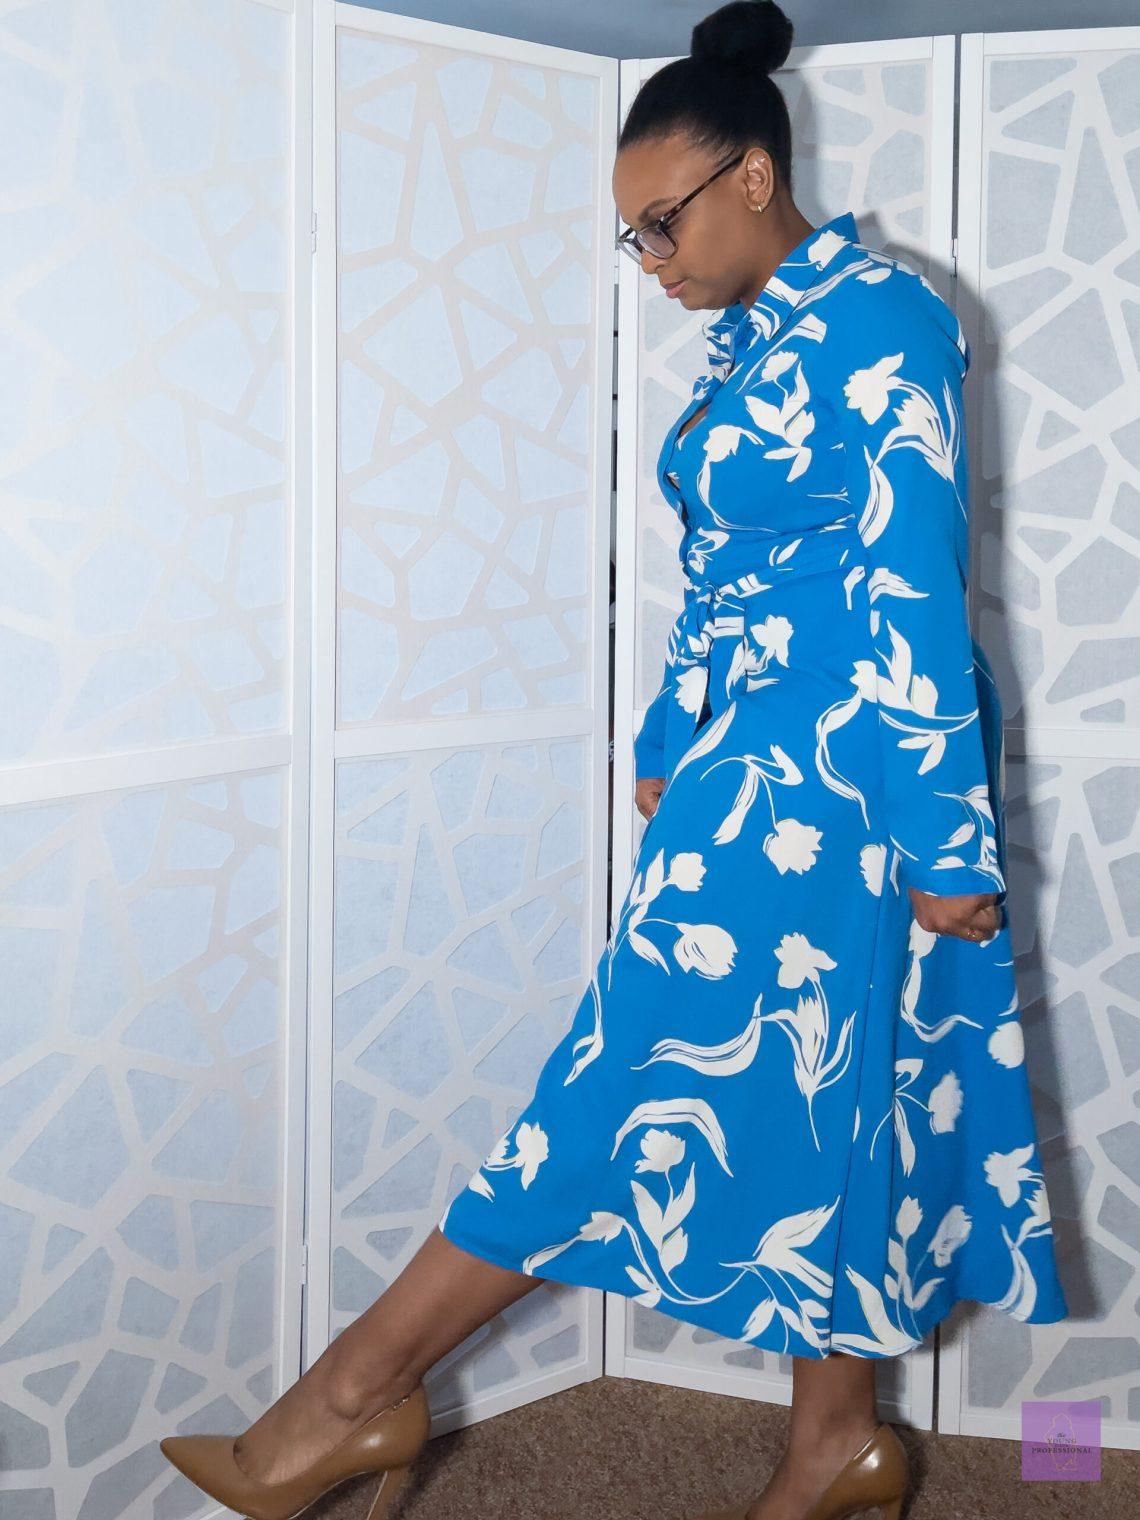 Colorful professional dress 4